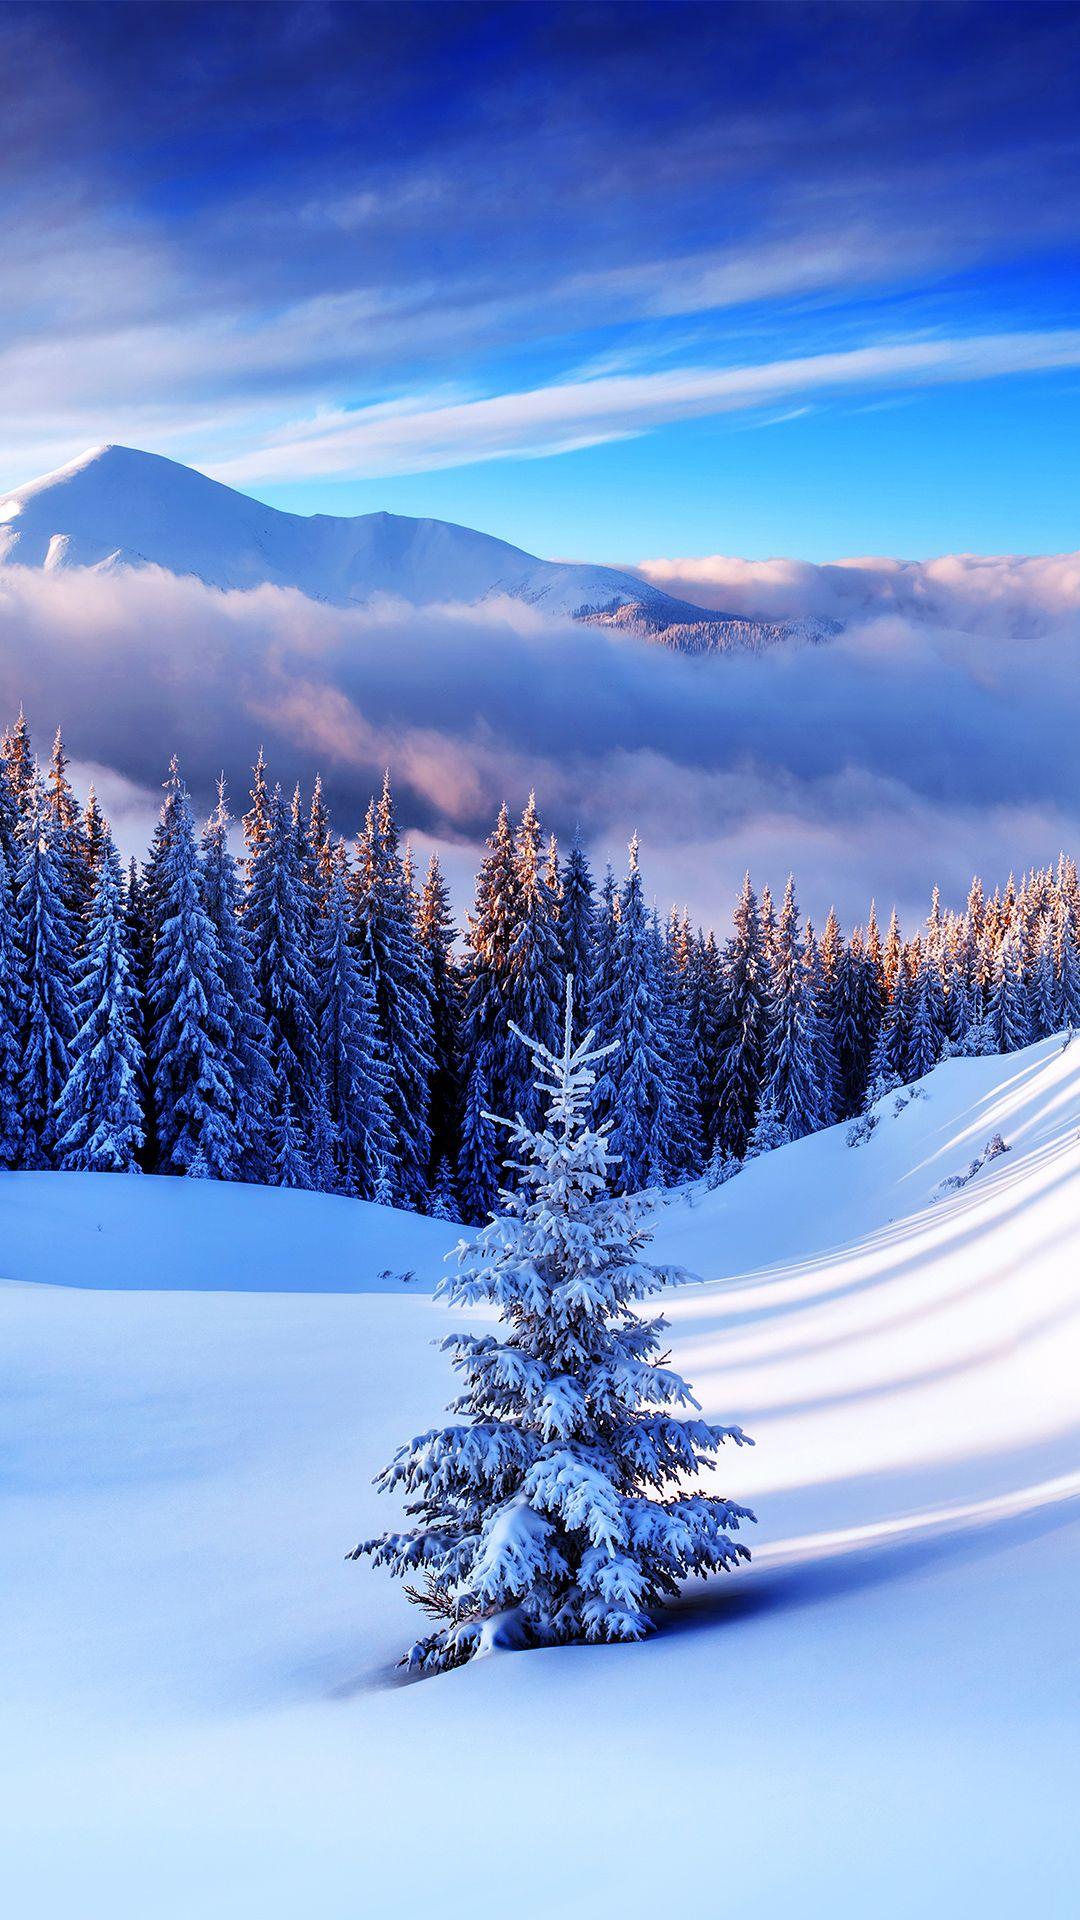 Winter Mountain Tree iPhone 6S Plus Wallpaper